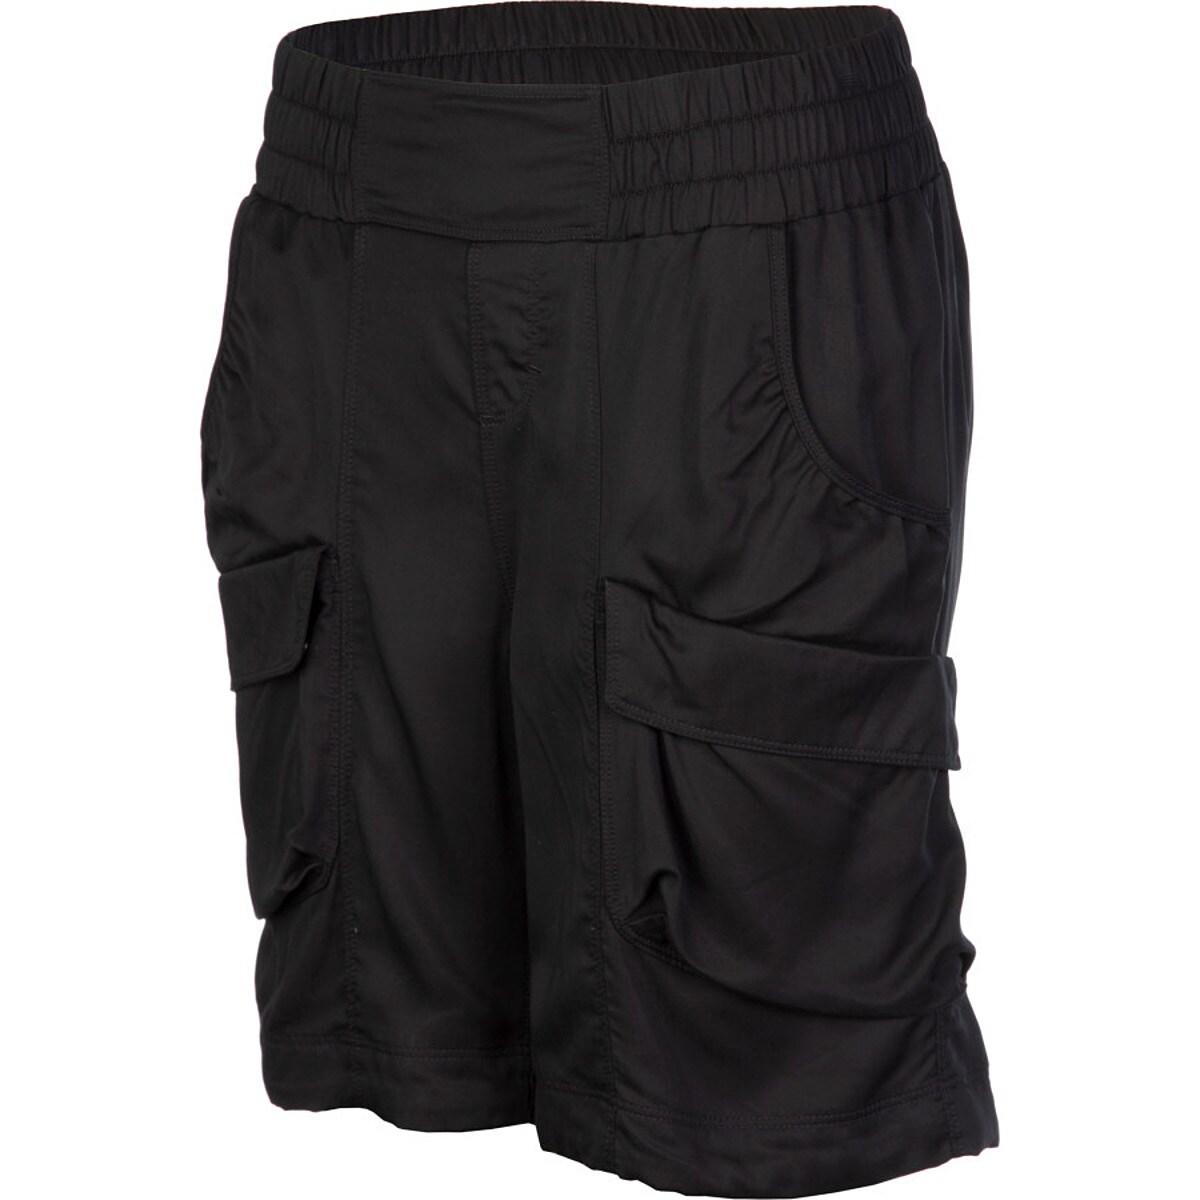 Lol Intown Short - Women's